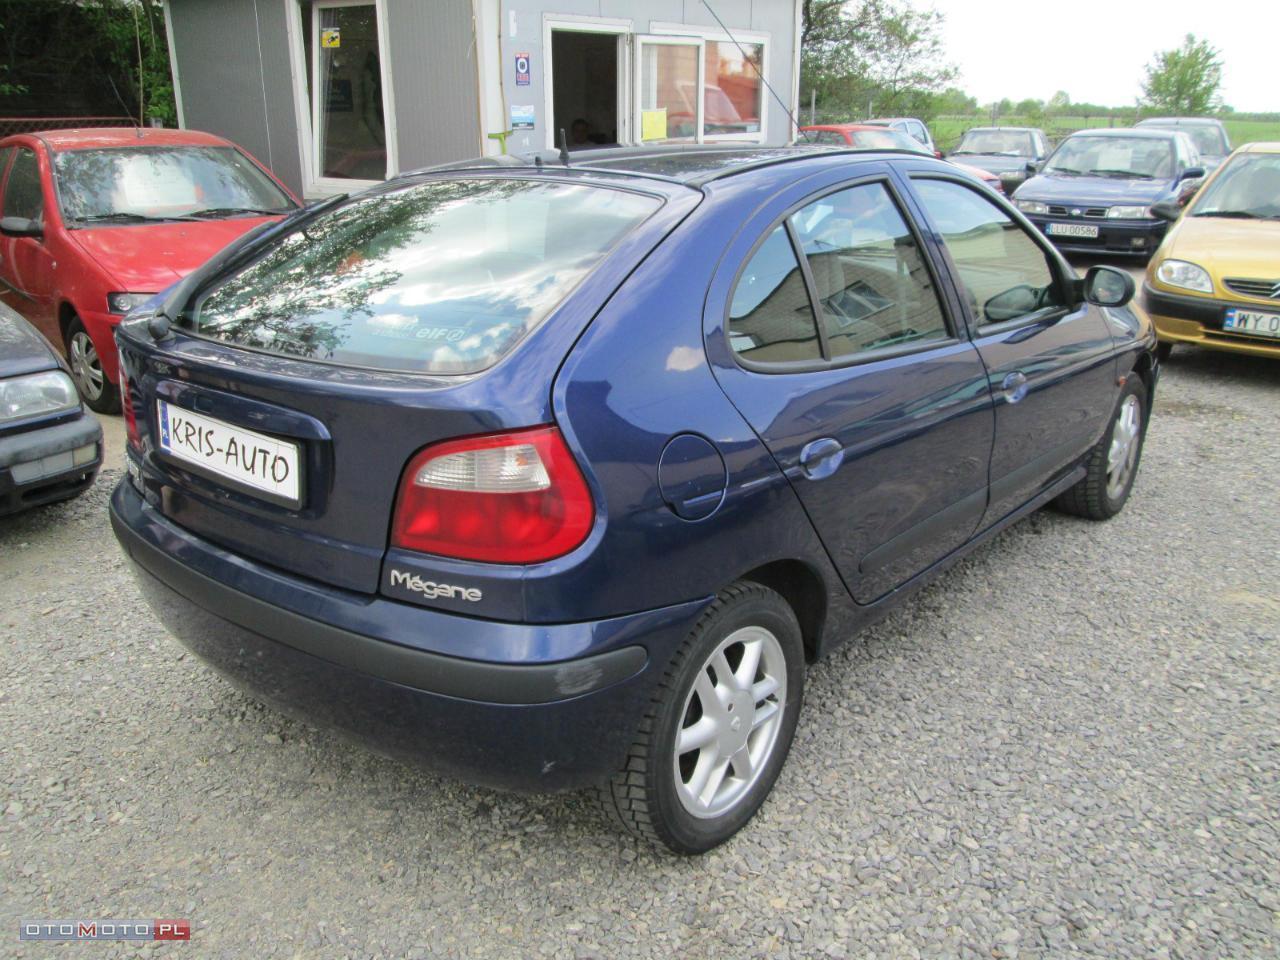 Renault Megane 02R 1.9DCI KLIMA ZADBANY_LUKOW